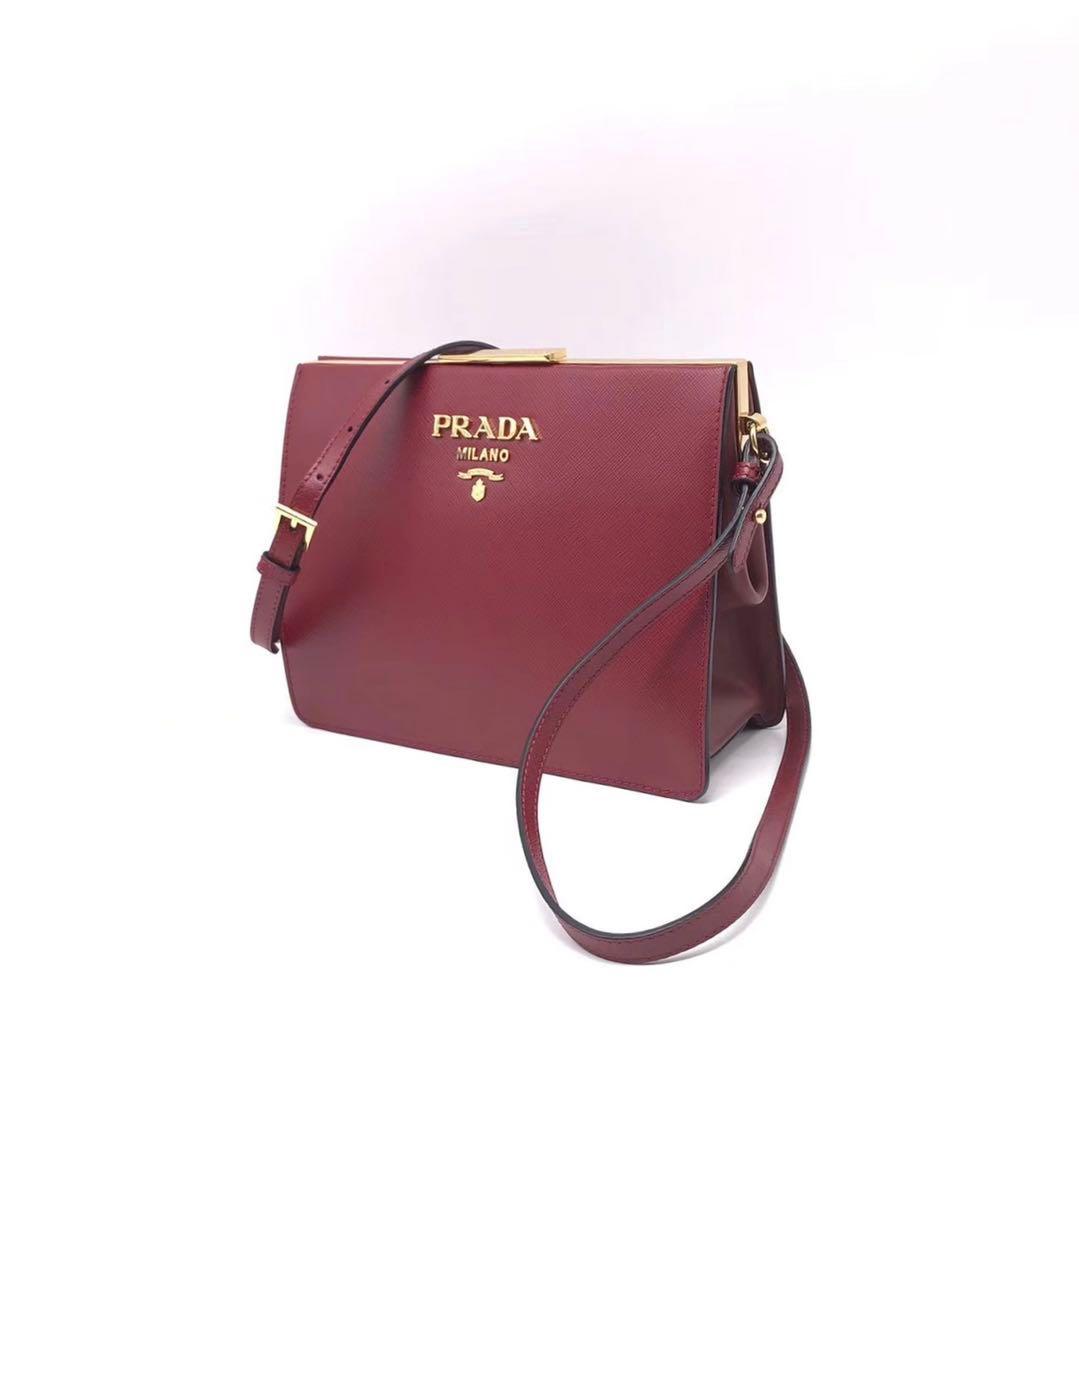 489b5131db68 Prada sling bag  SALE